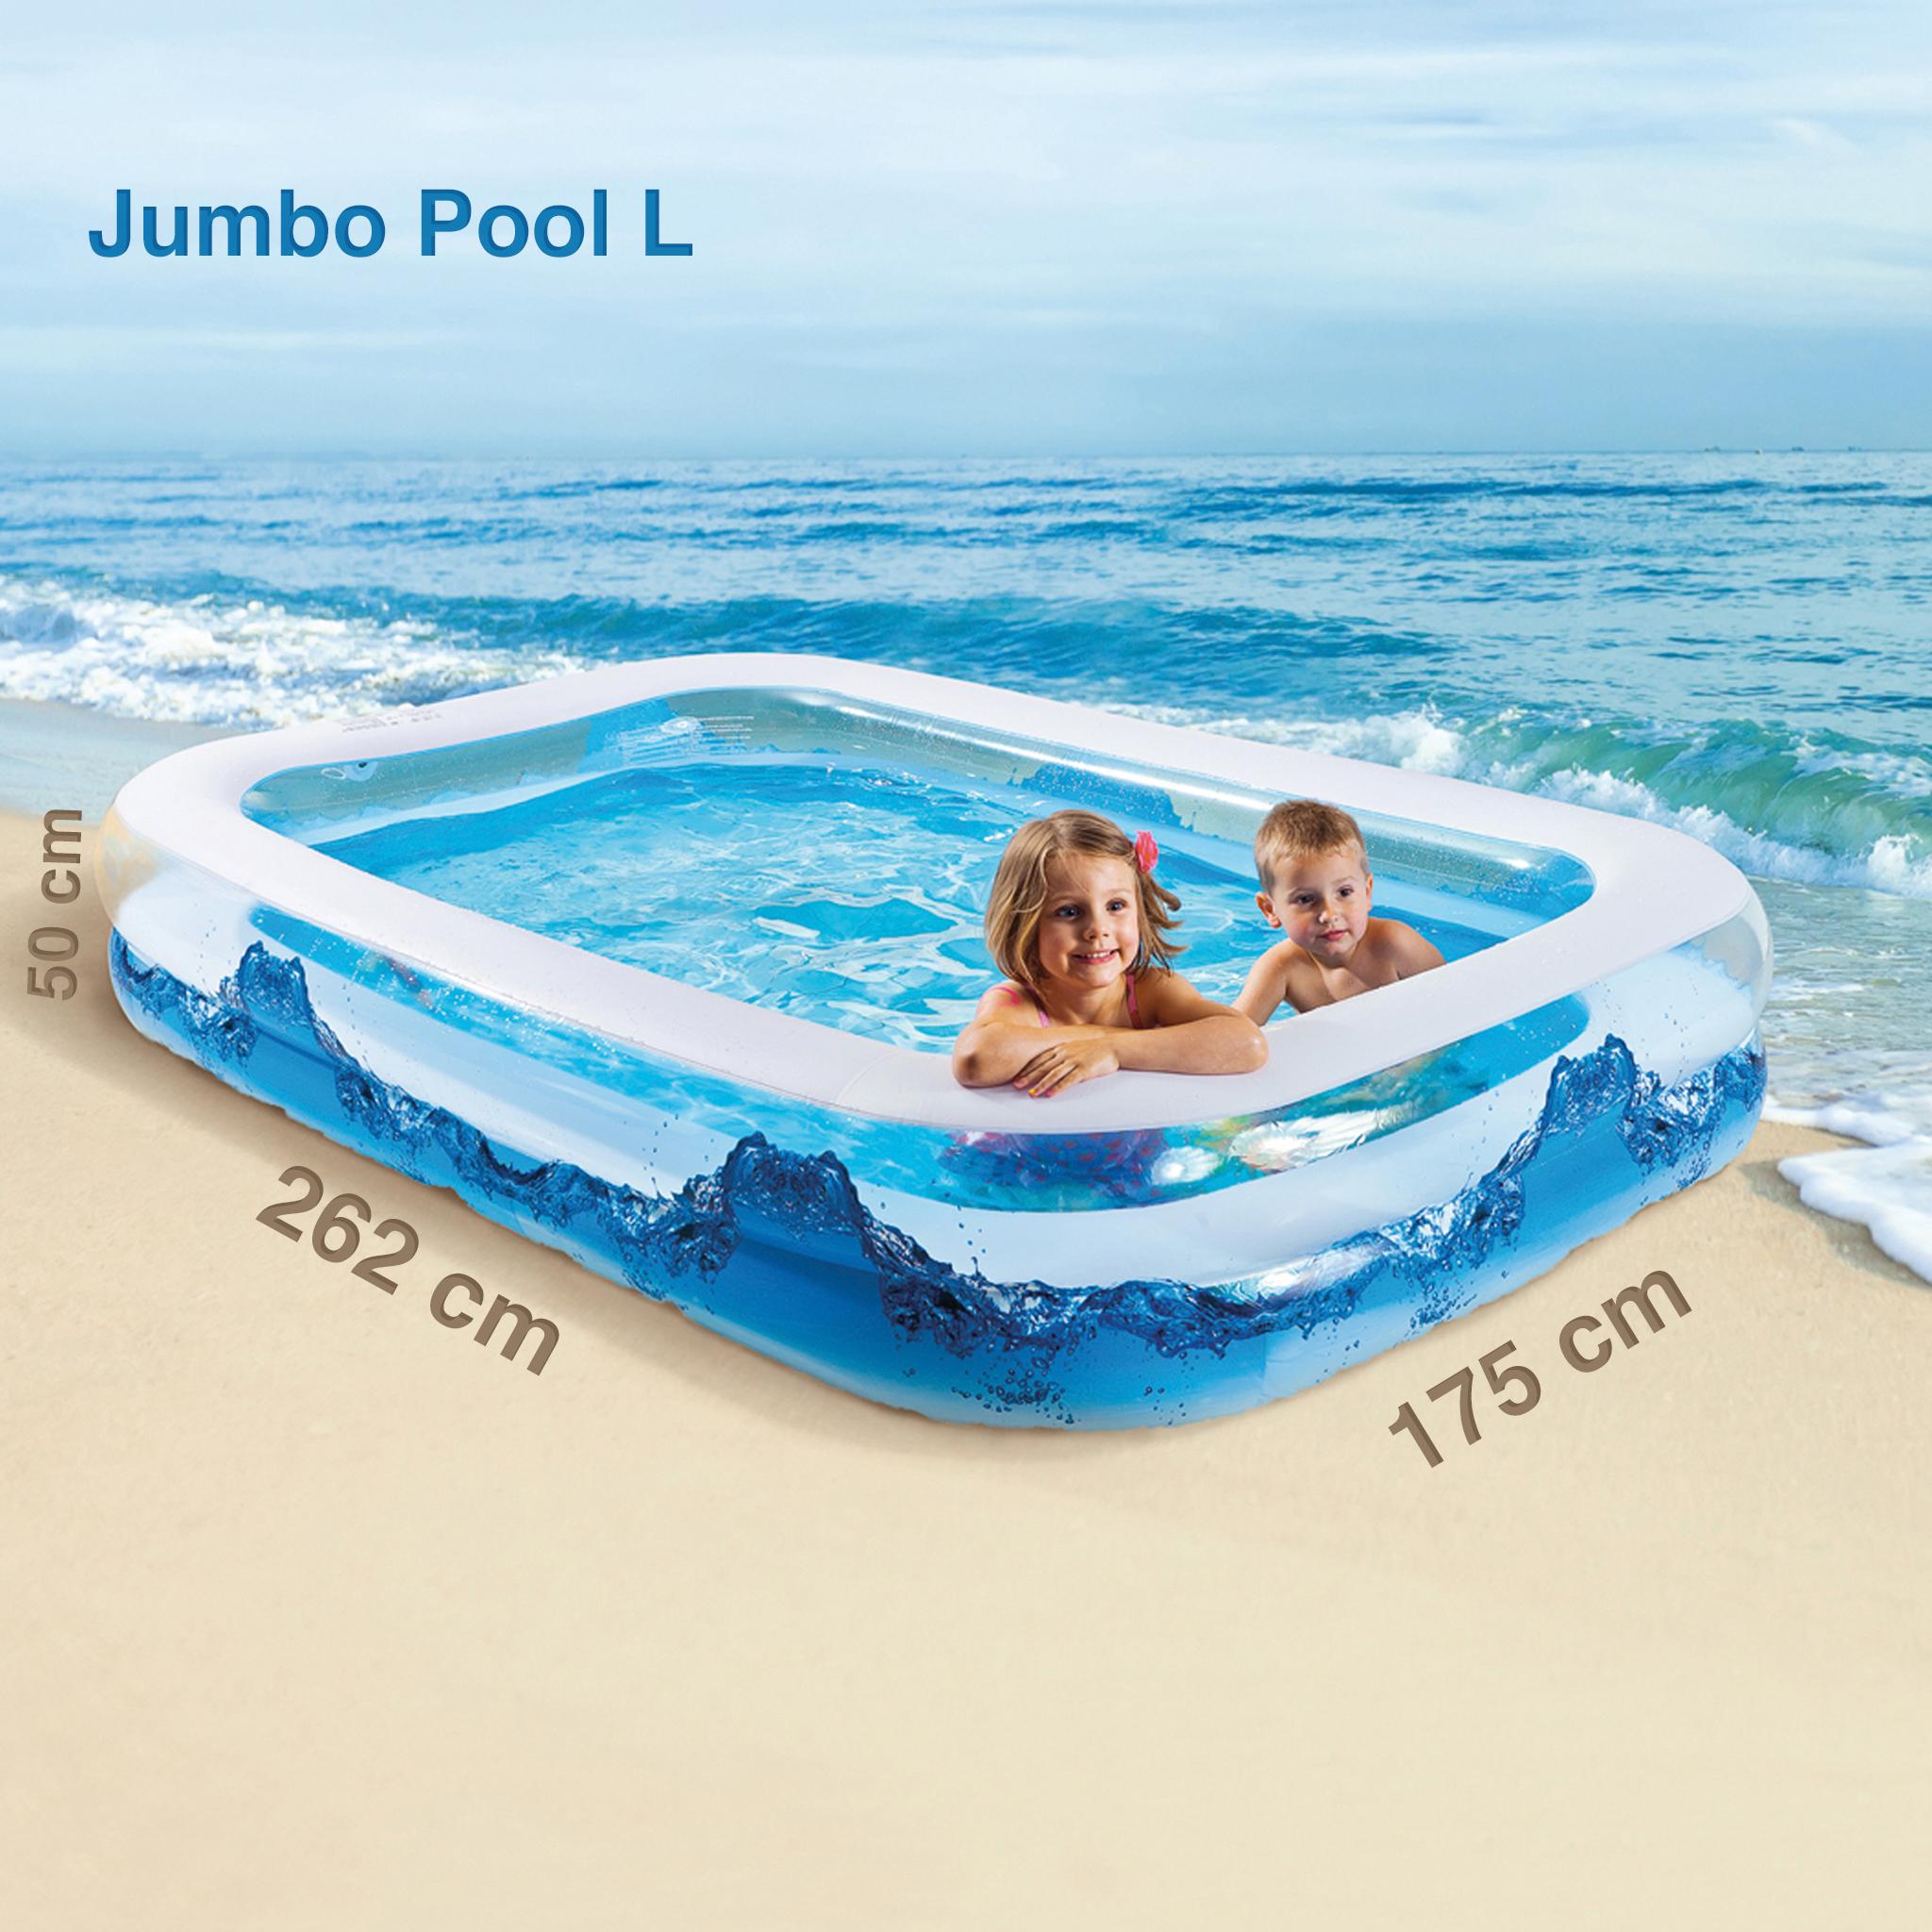 jumbo family pool kinder planschbecken schwimmbecken mit 2 w lsten vida home der onlineshop. Black Bedroom Furniture Sets. Home Design Ideas